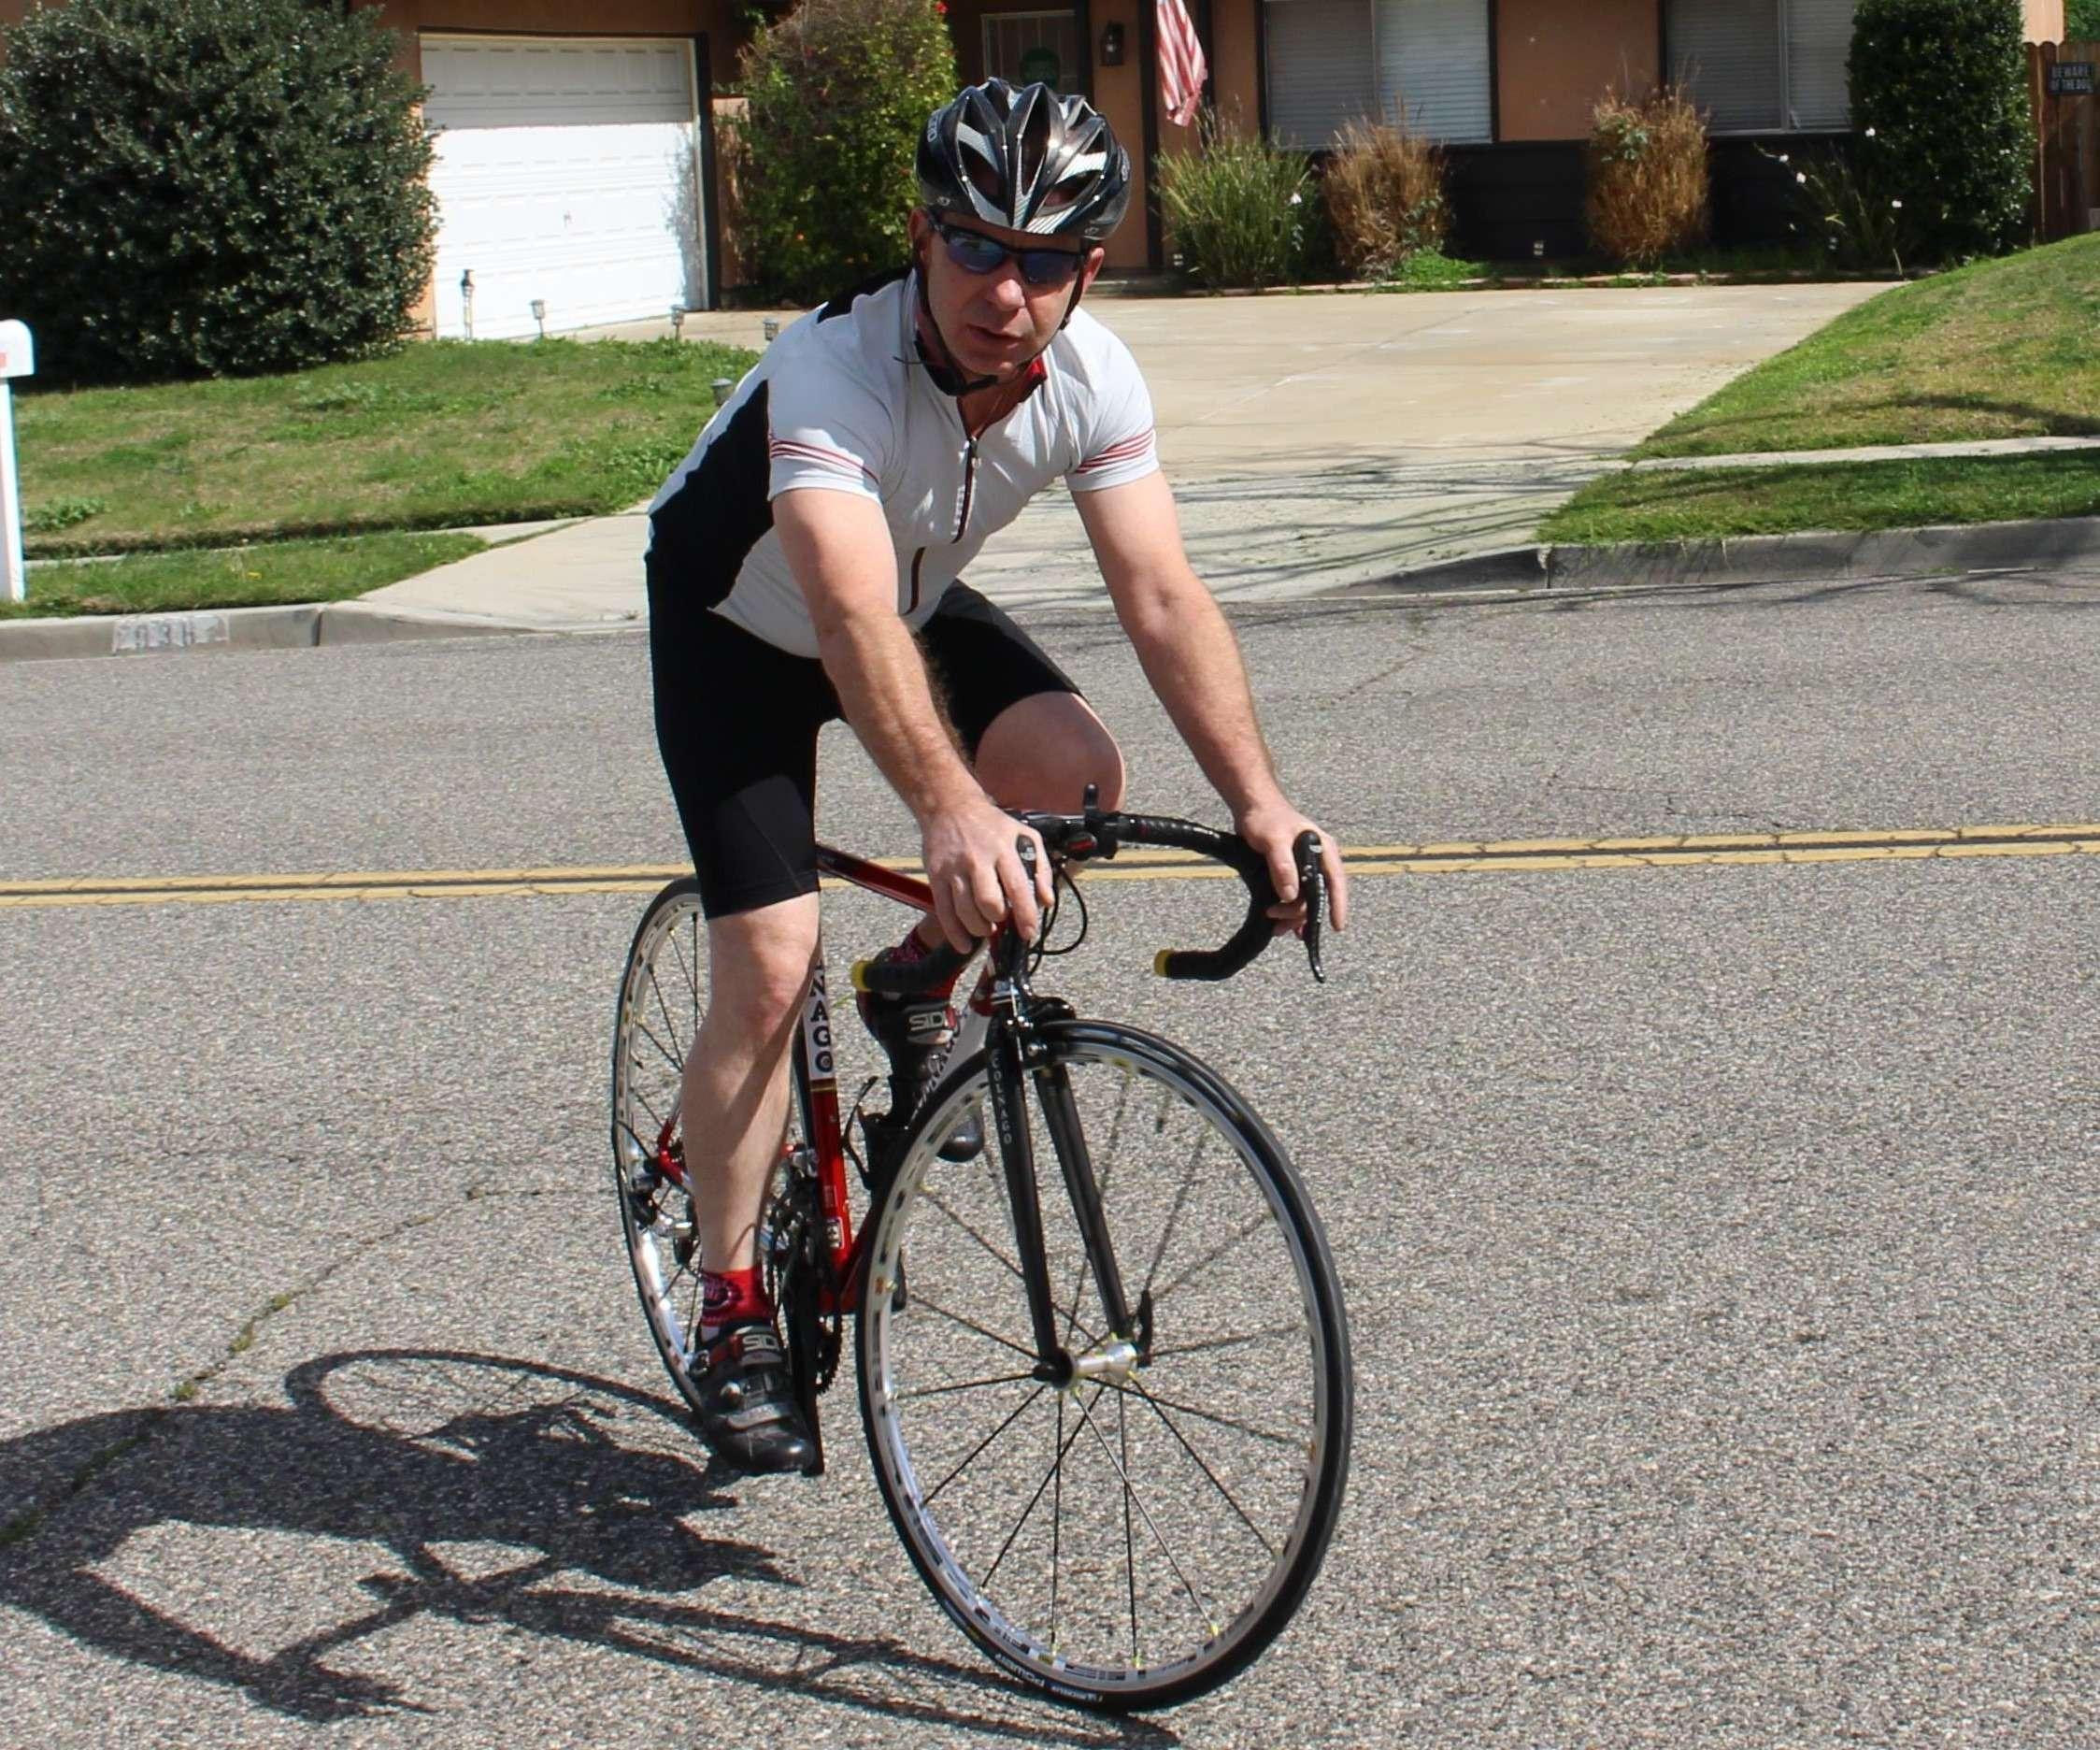 Bob on his bike